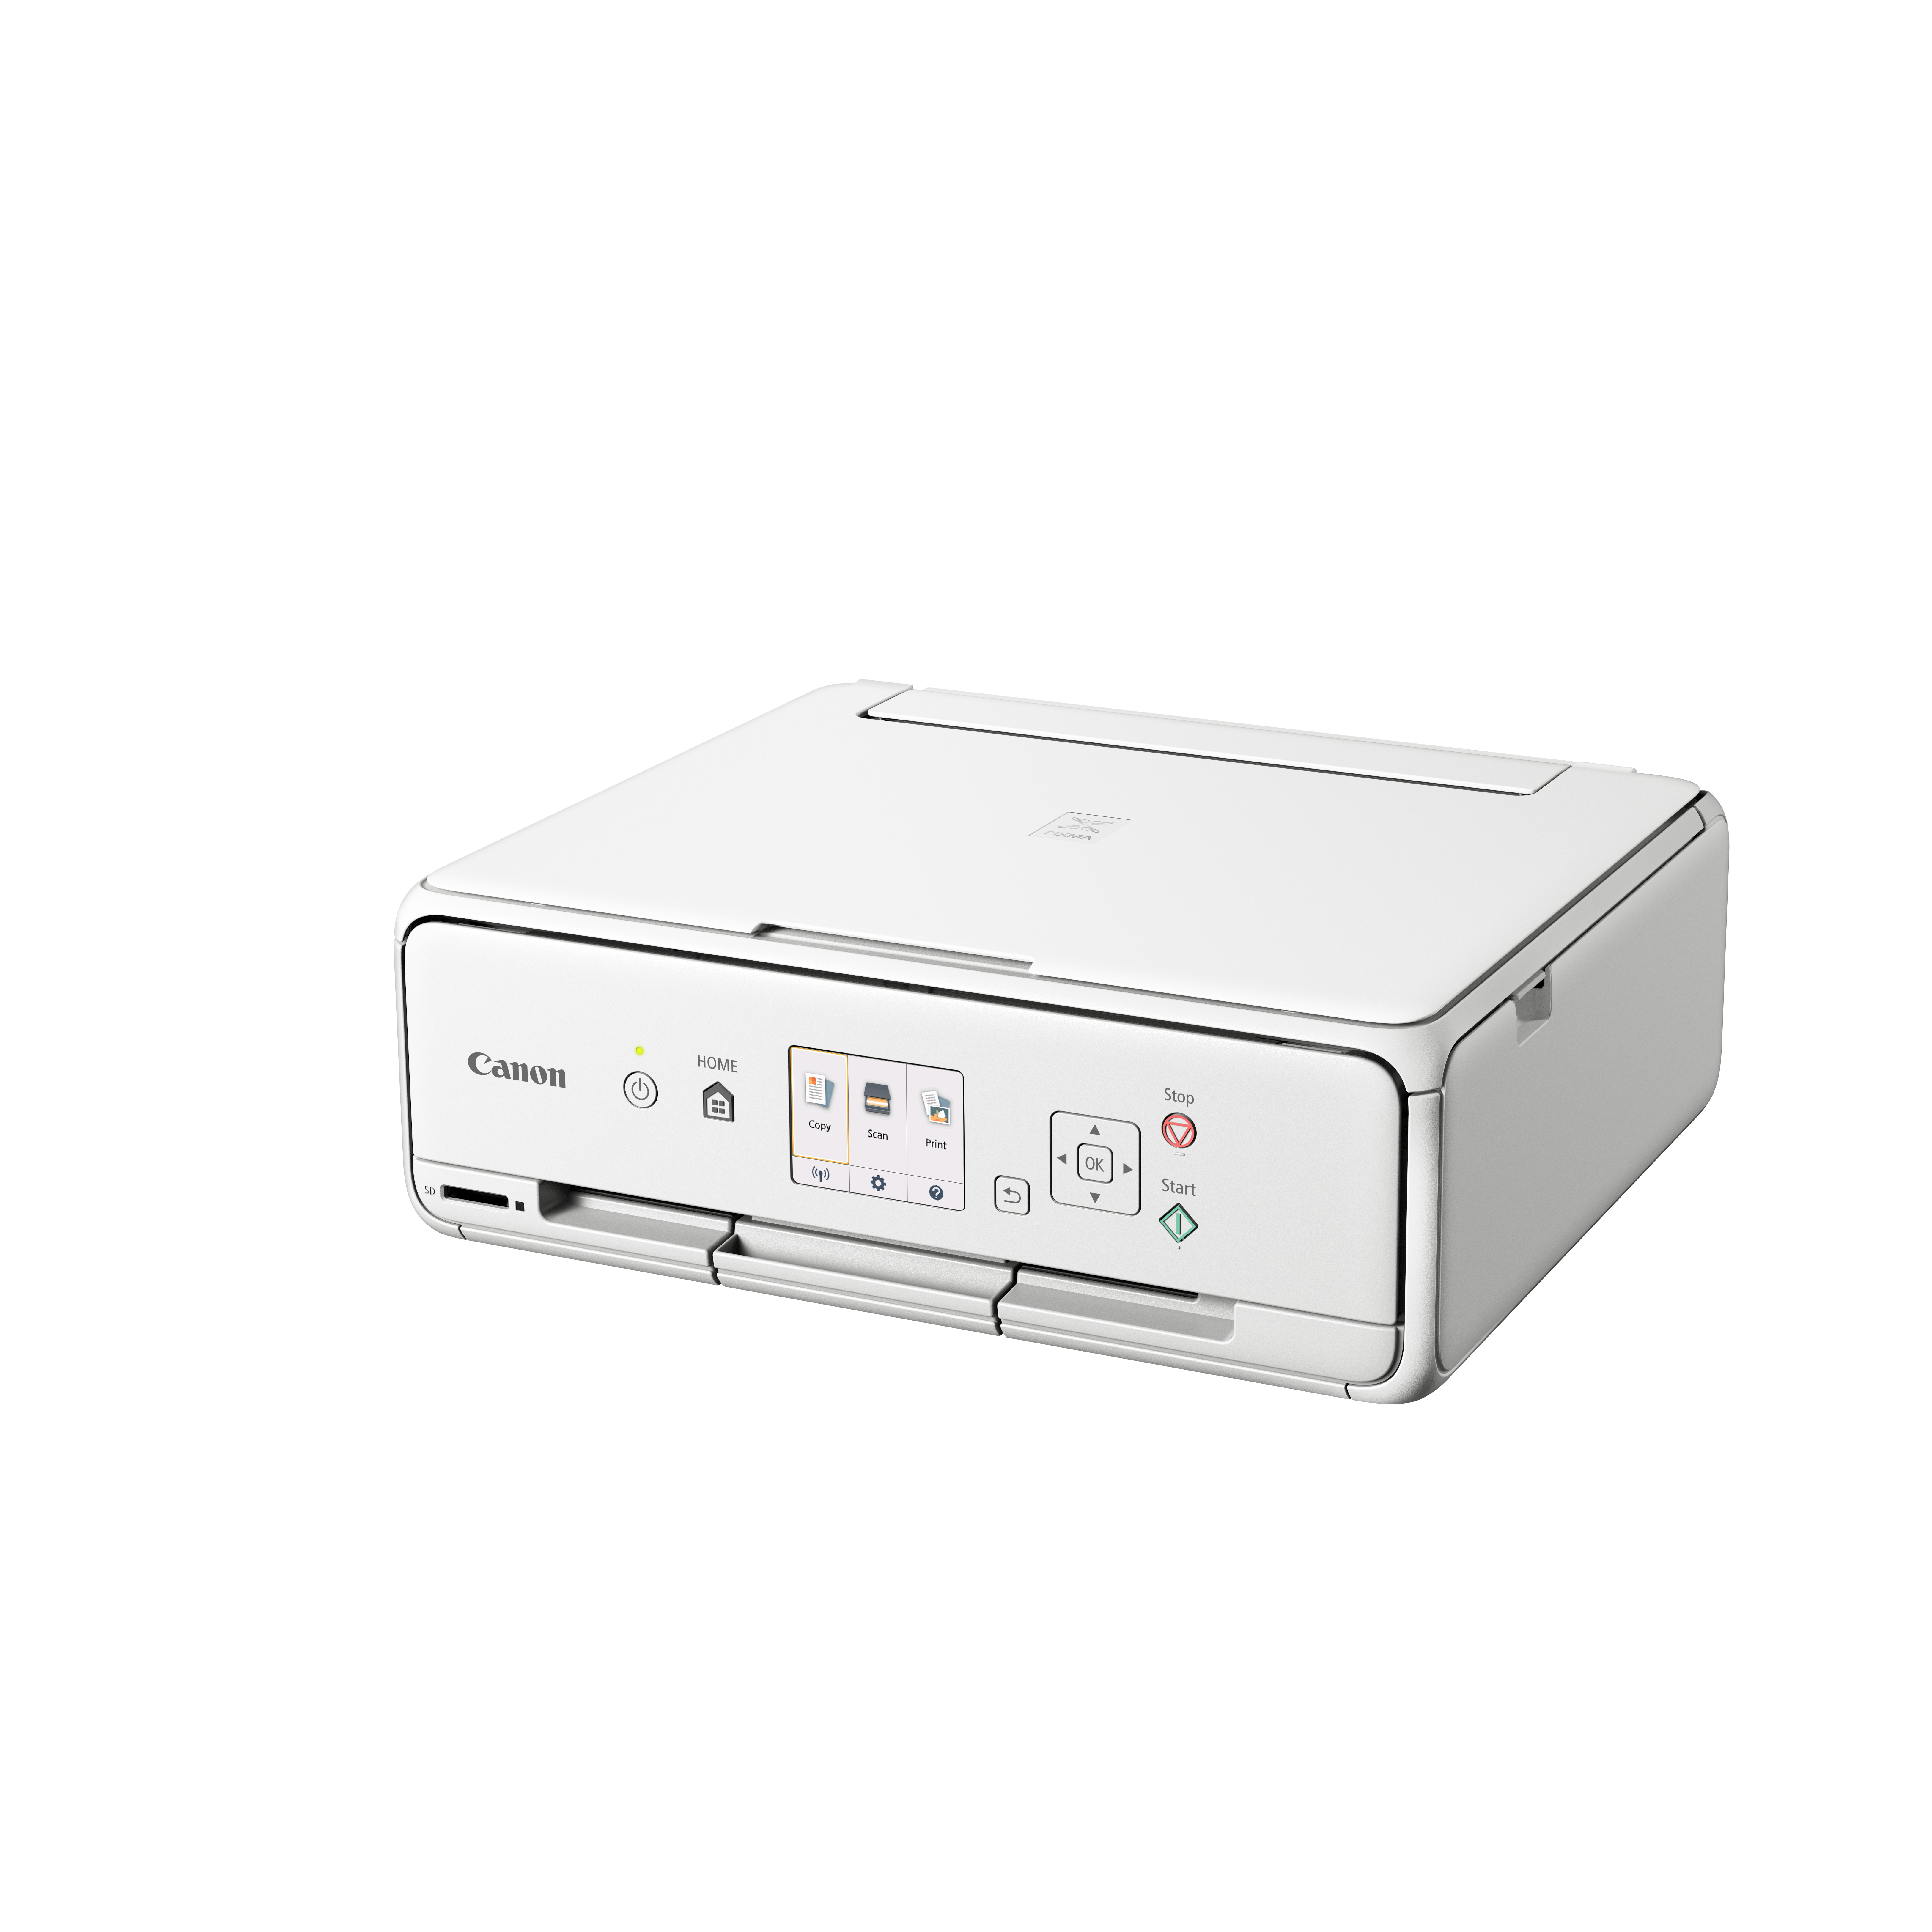 Canon-PIXMA-TS5051-Multifunktionsgeraet-Drucker-Scanner-Kopierer-weiss-5-Tinten Indexbild 3